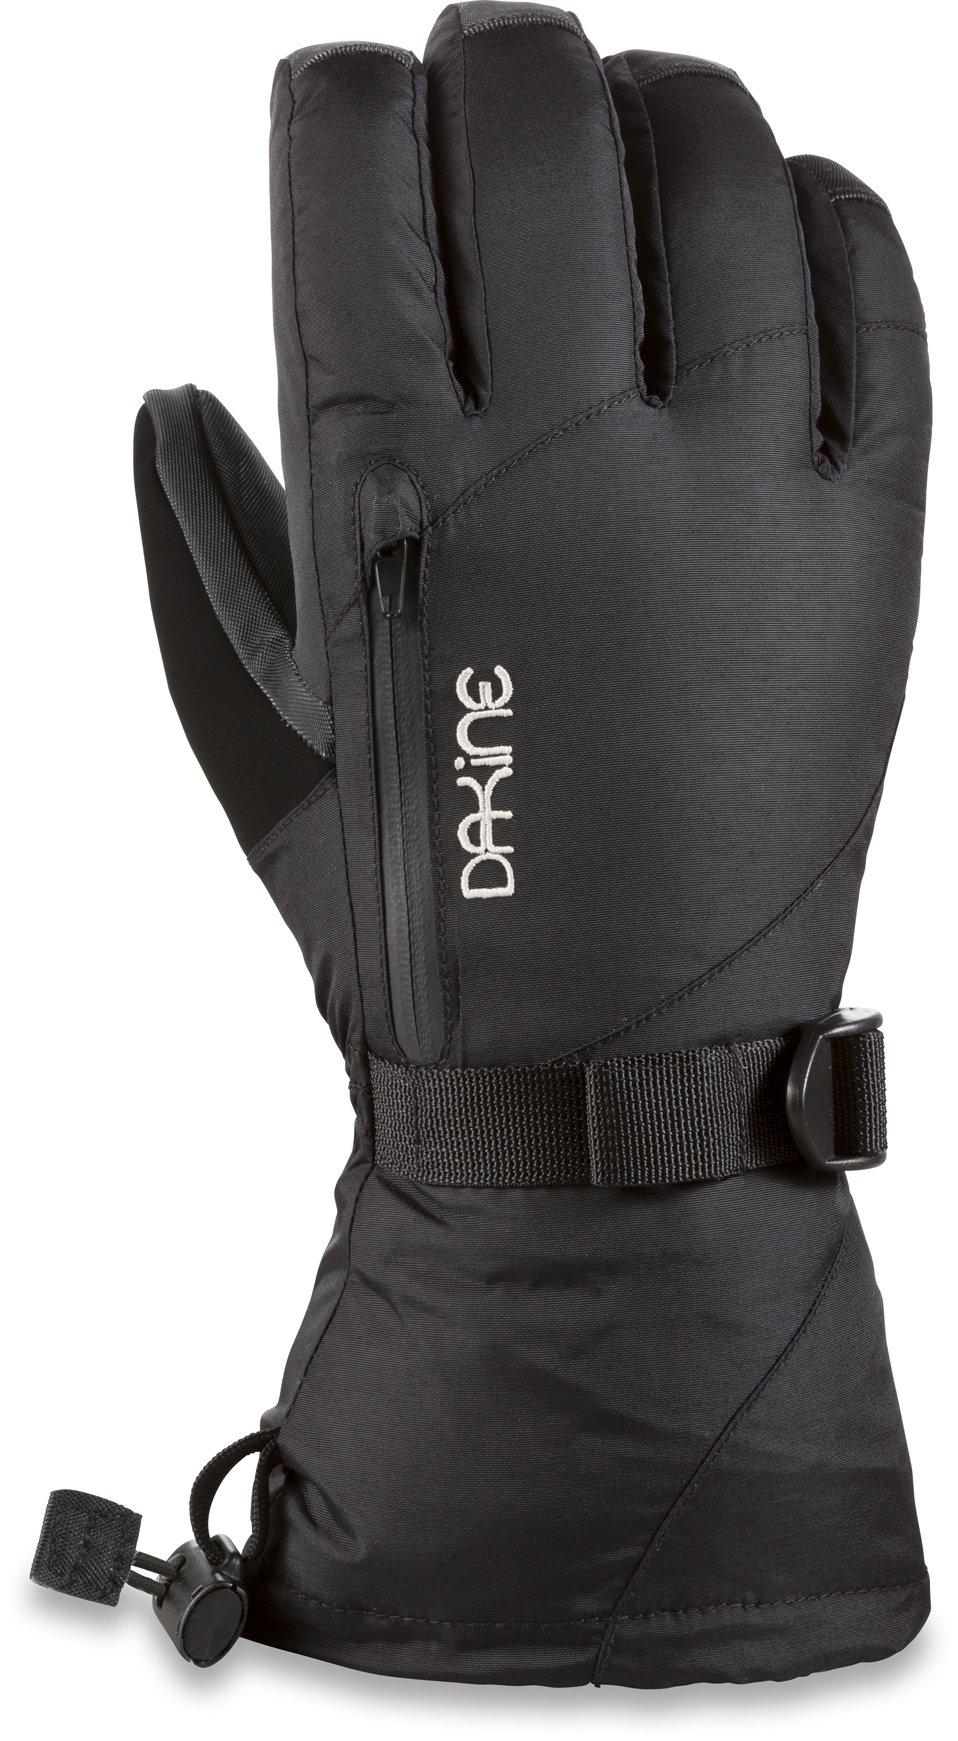 Dakine Women's Sequoia Glove, Black Small